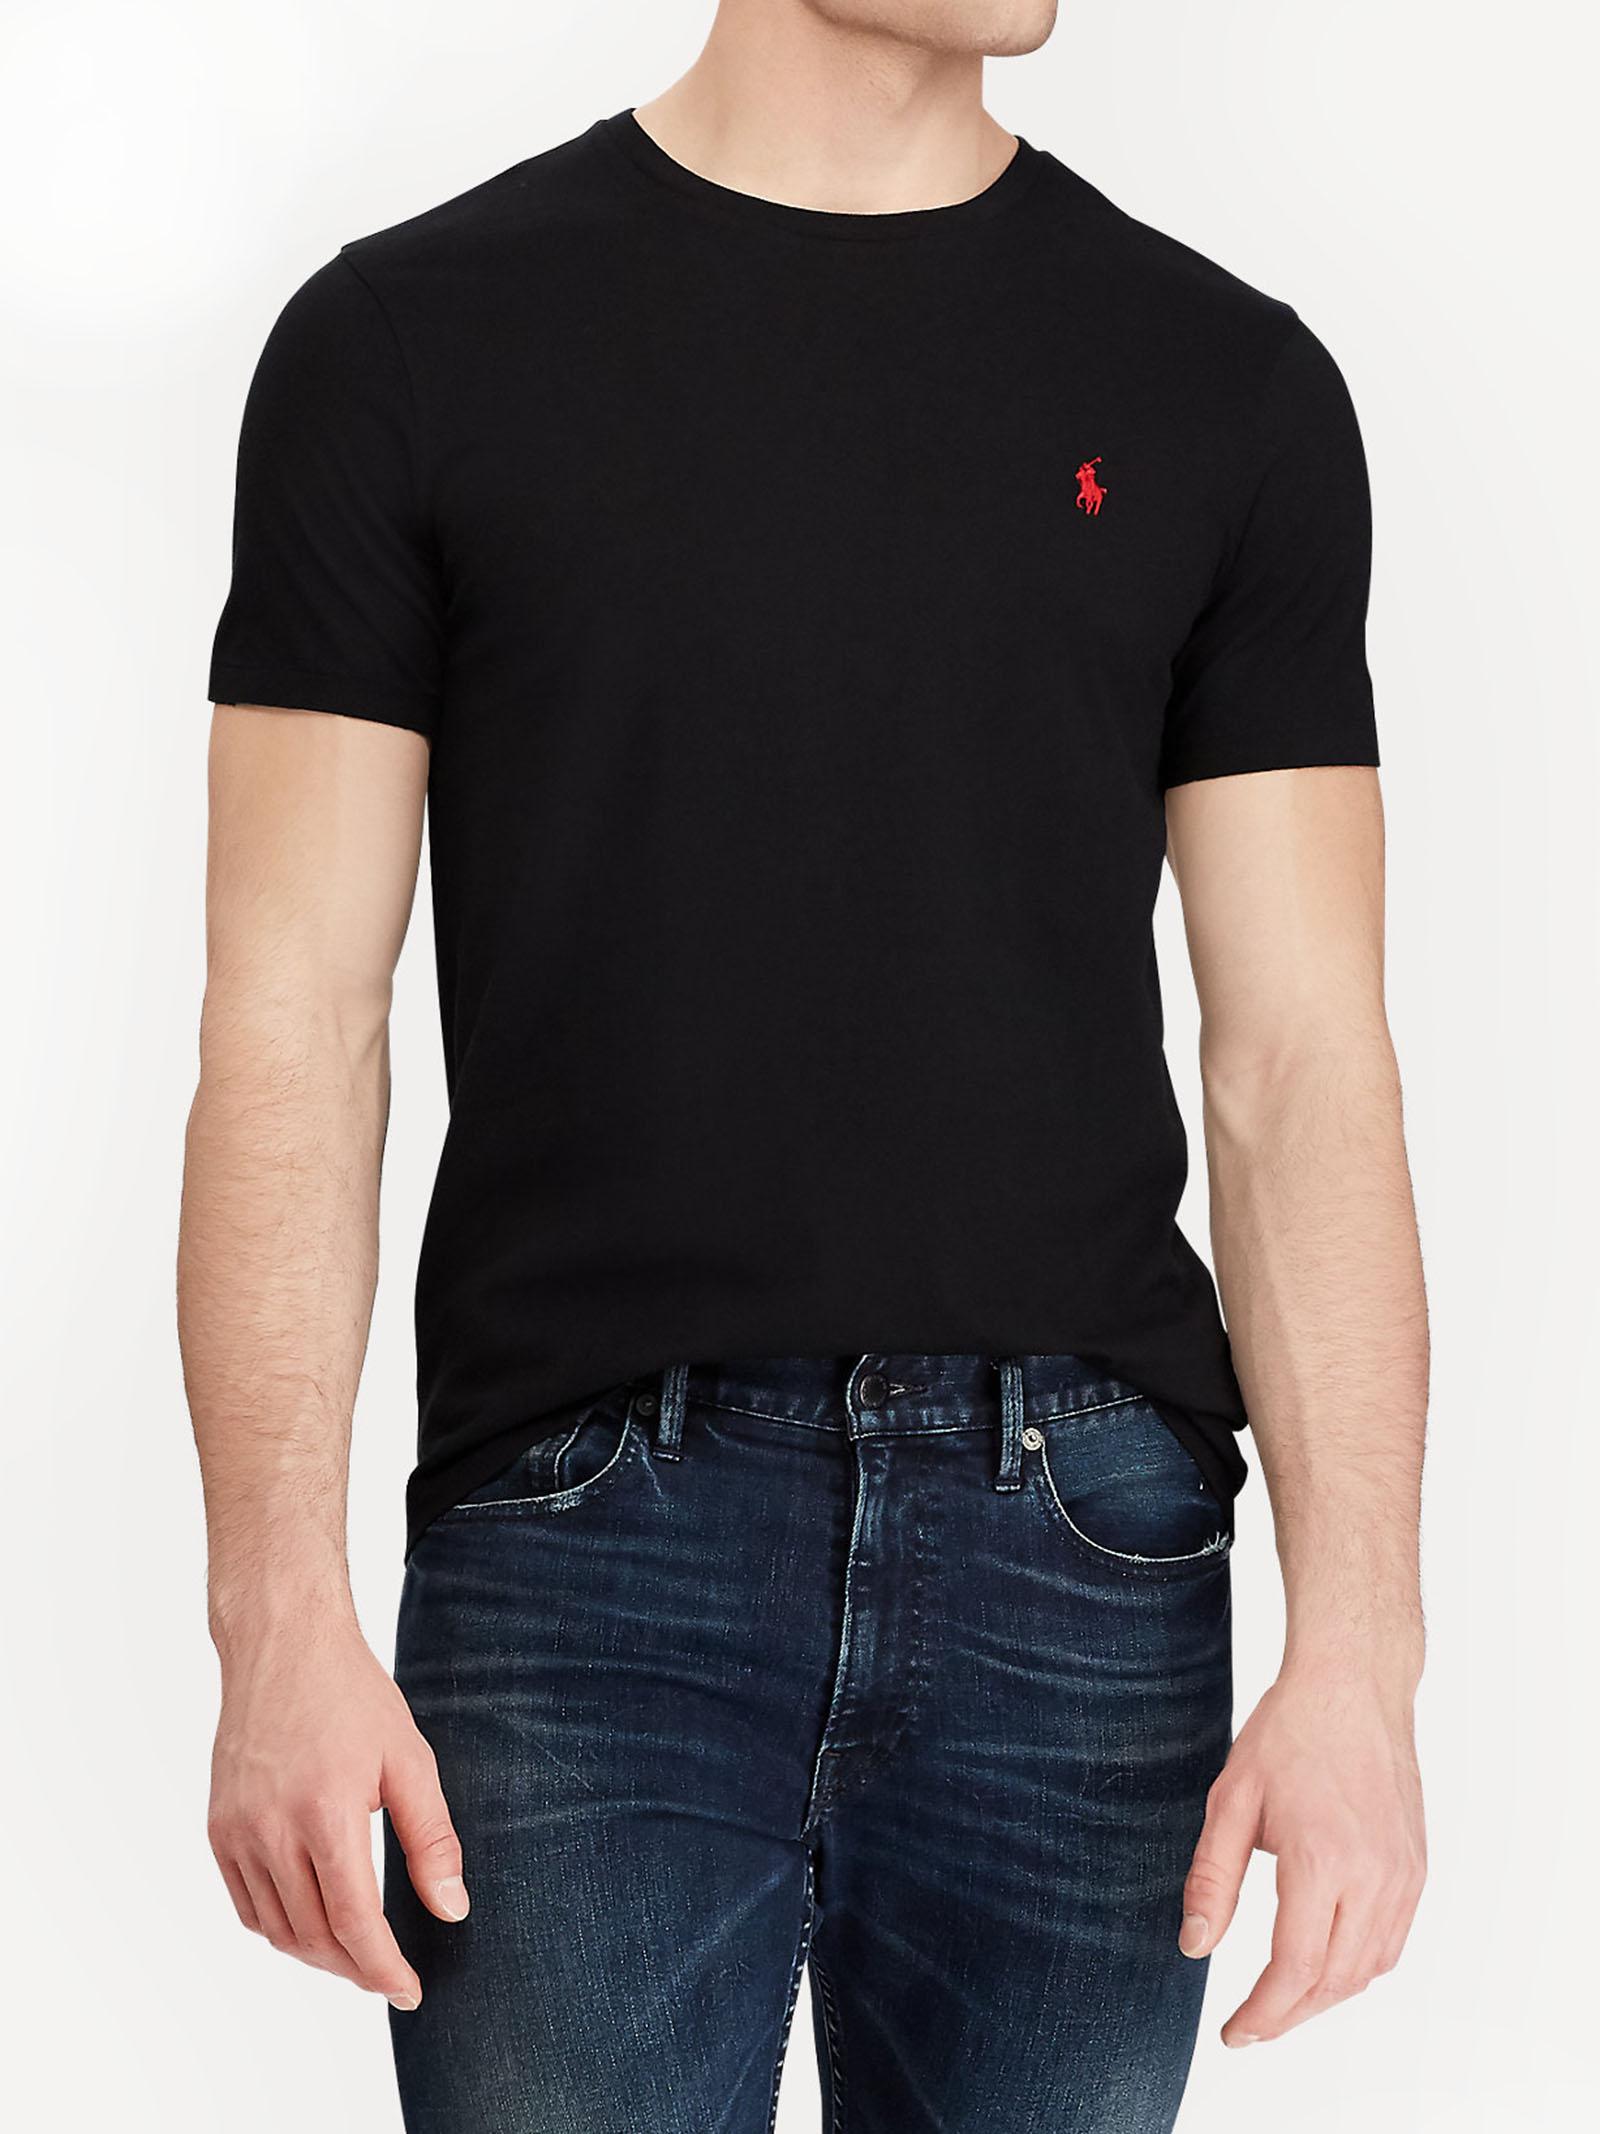 T-shirt girocollo slim fit RALPH LAUREN | T-shirt | 710-680785001